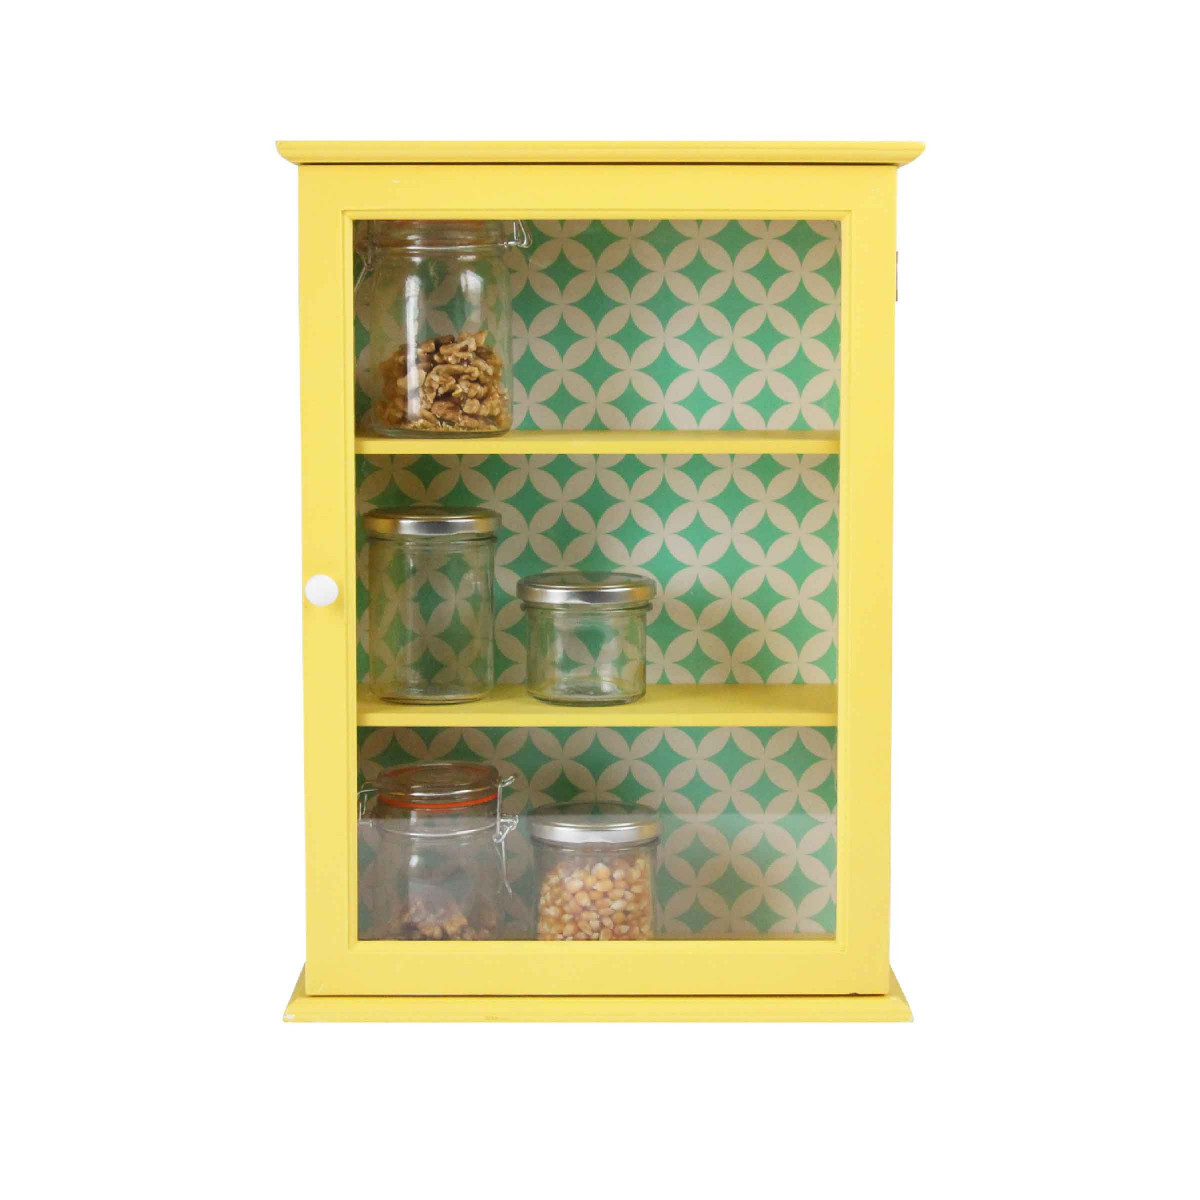 petite armoire vitr e jaune. Black Bedroom Furniture Sets. Home Design Ideas